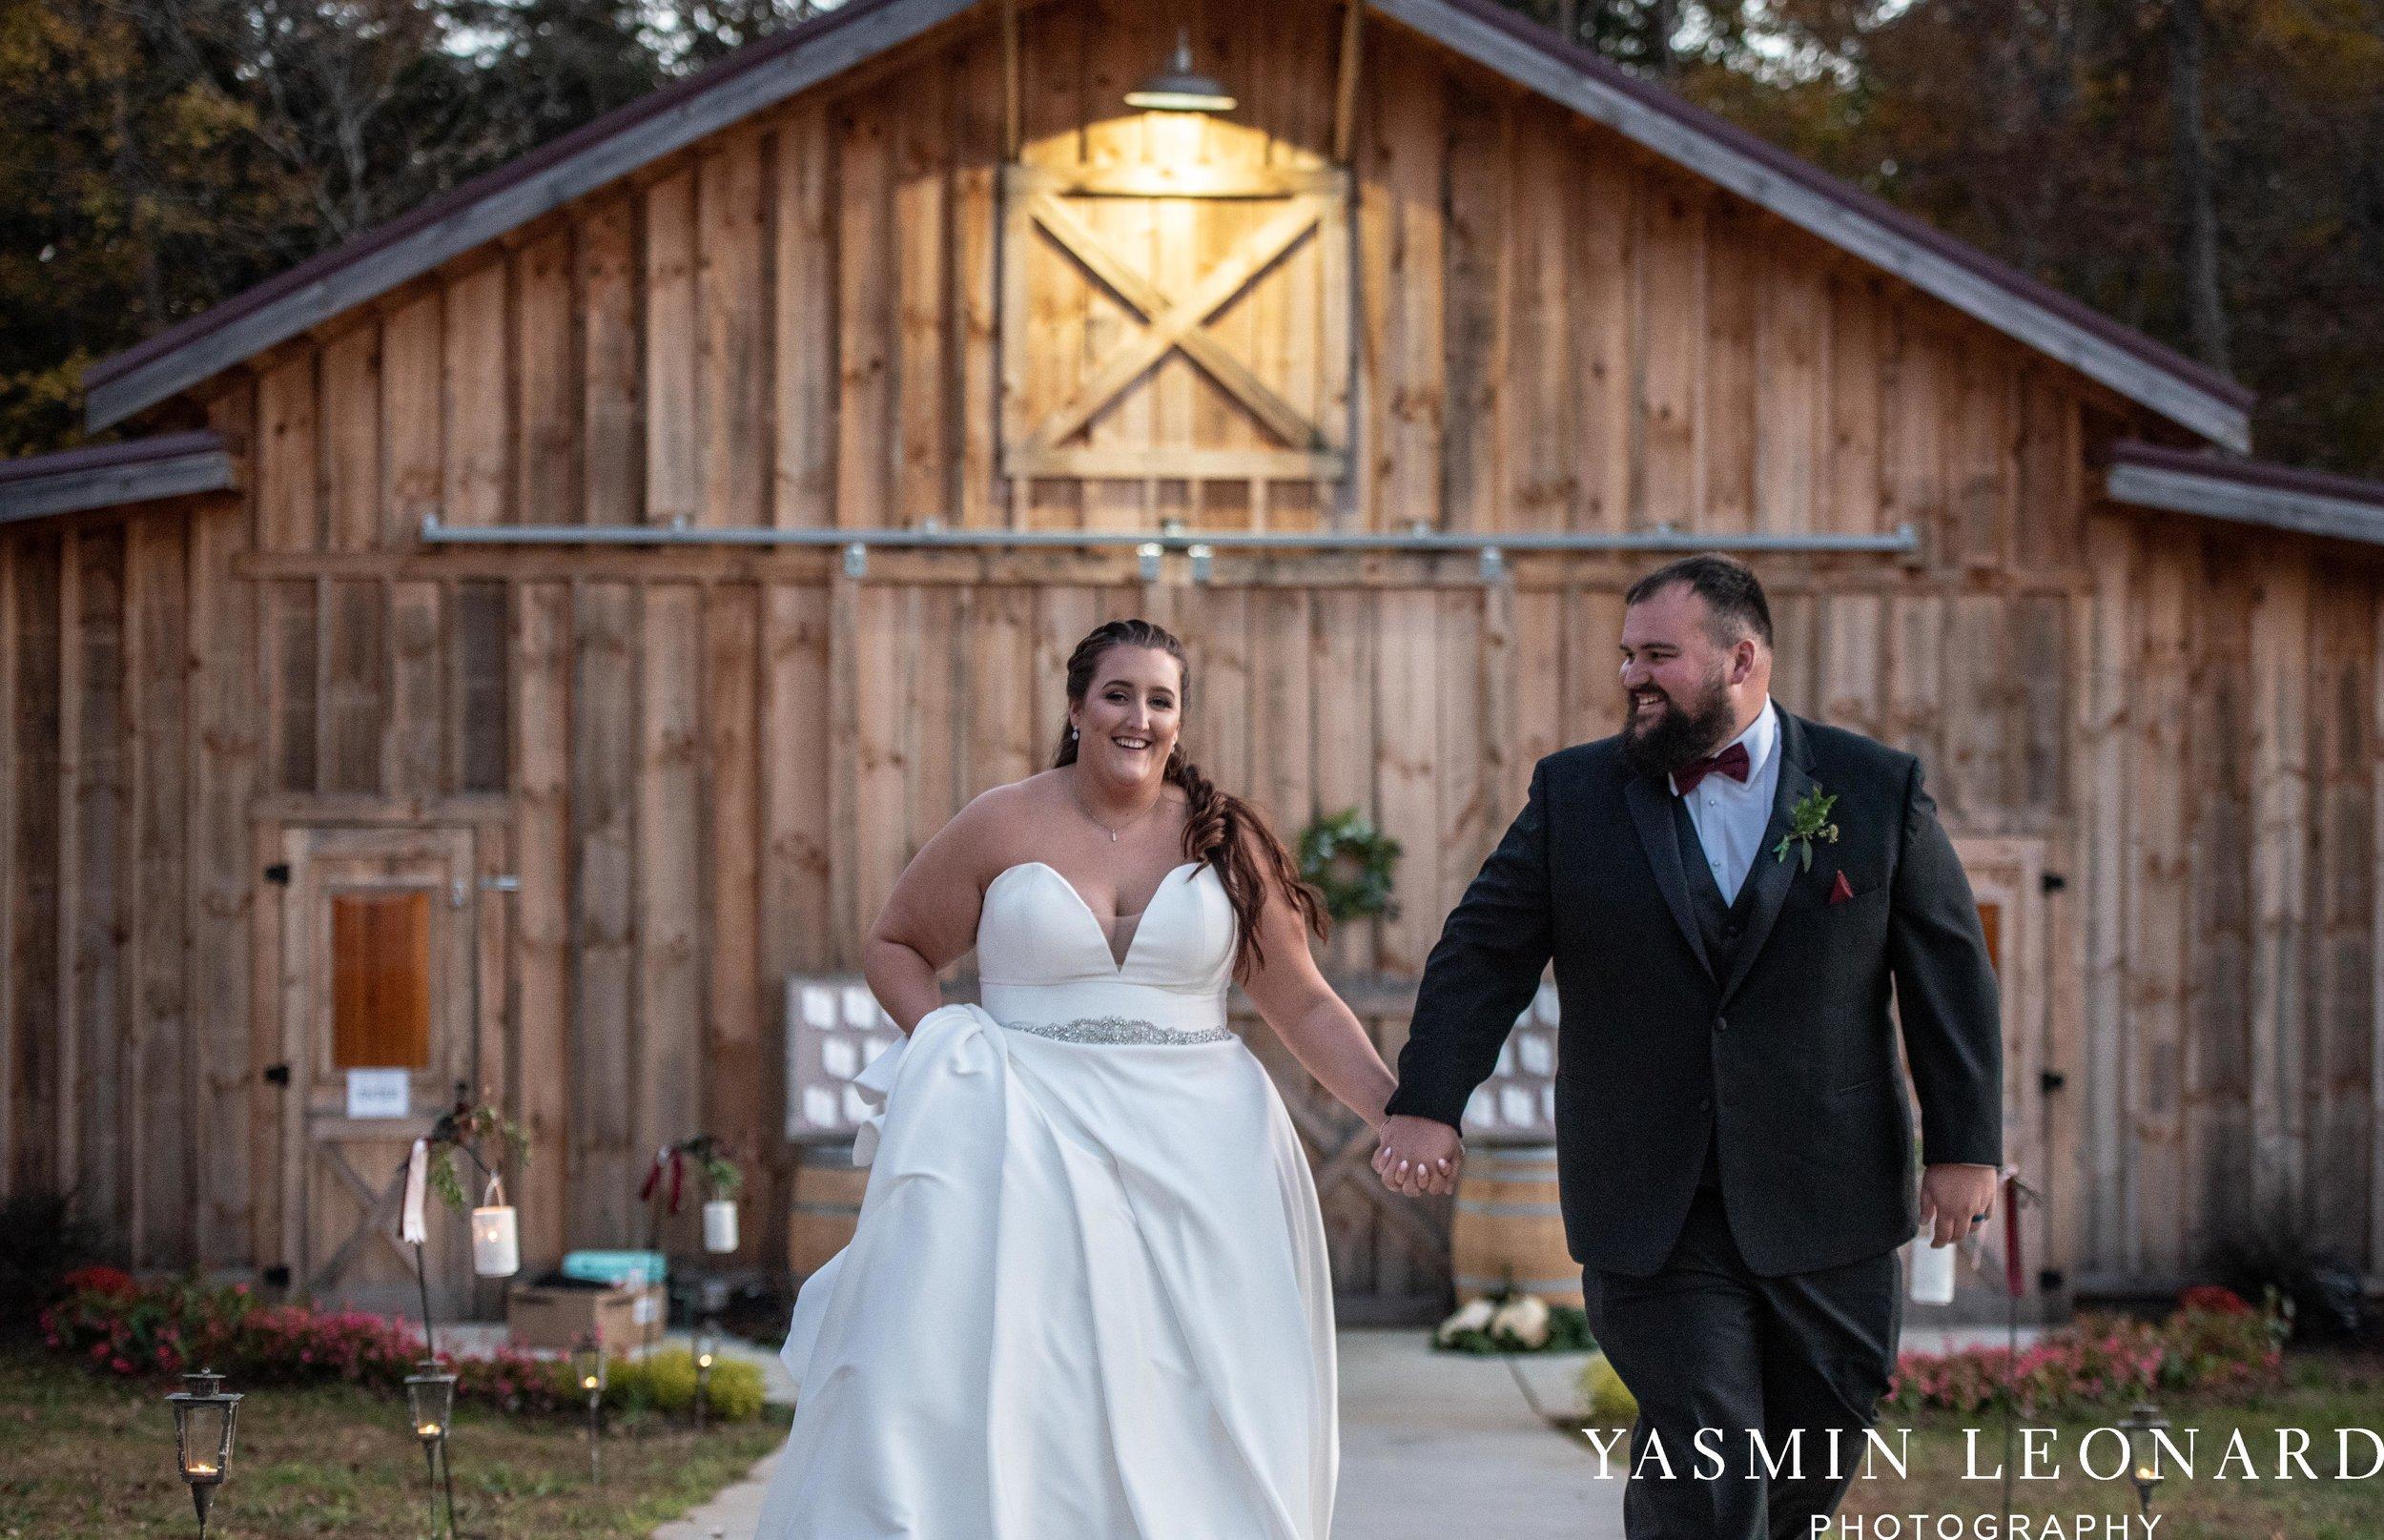 Wesley Memorial United Methodist Church - Old Homeplace Winery - High Point Weddings - High Point Wedding Photographer - NC Weddings - NC Barn Venue - Yasmin Leonard Photography-65.jpg